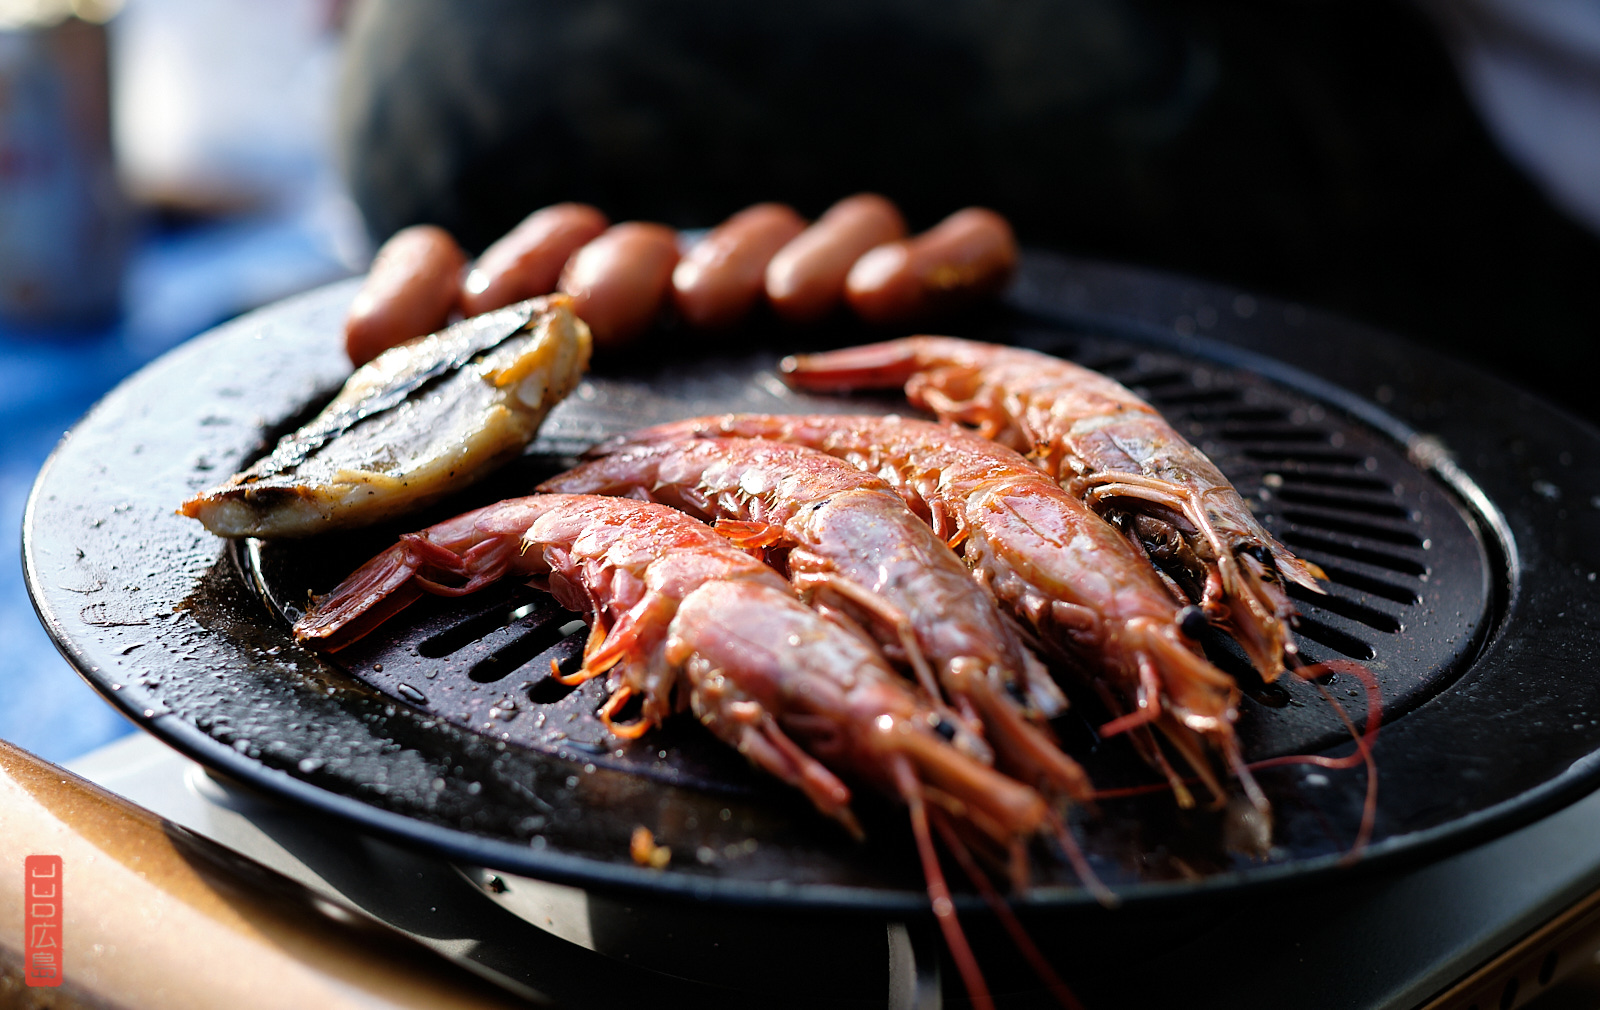 AVril 2020, Hiroshima, hanami, barbecue, crevettes